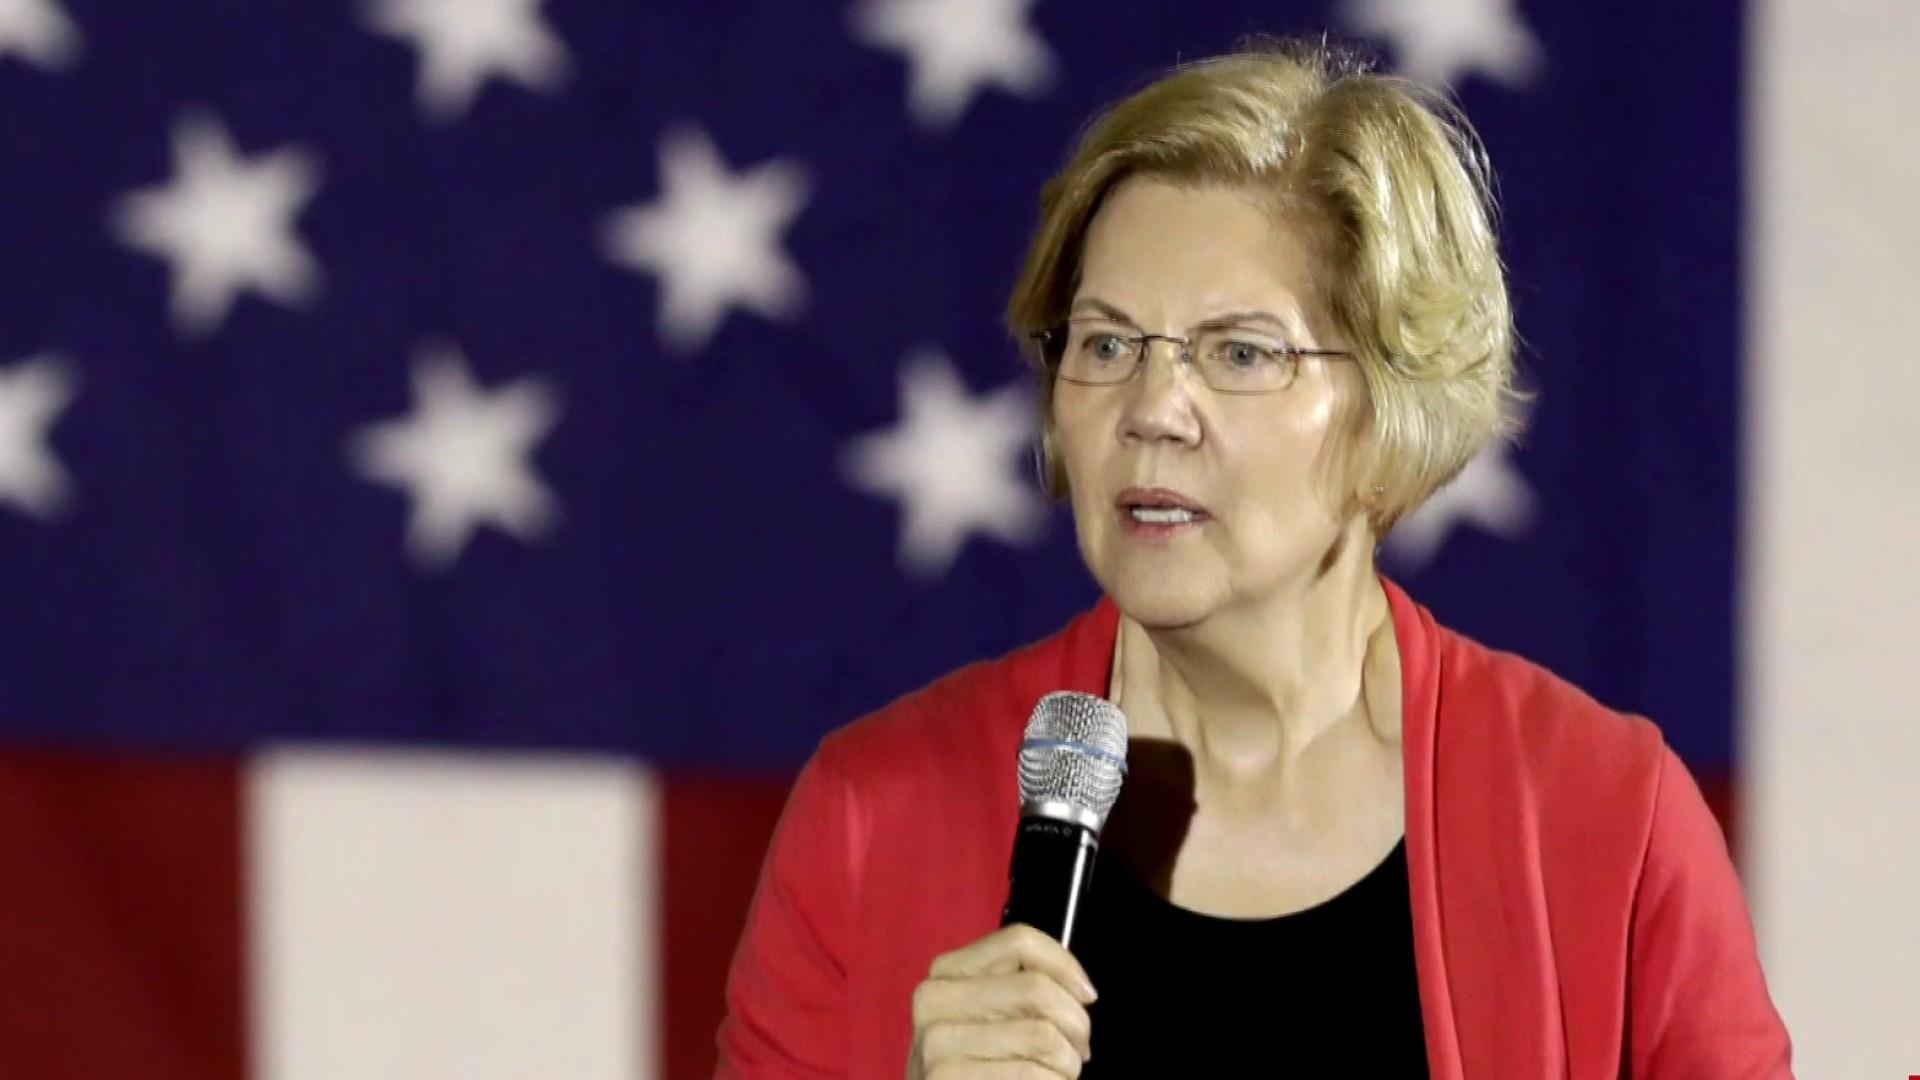 Sen. Warren gains in 2020 poll after debate